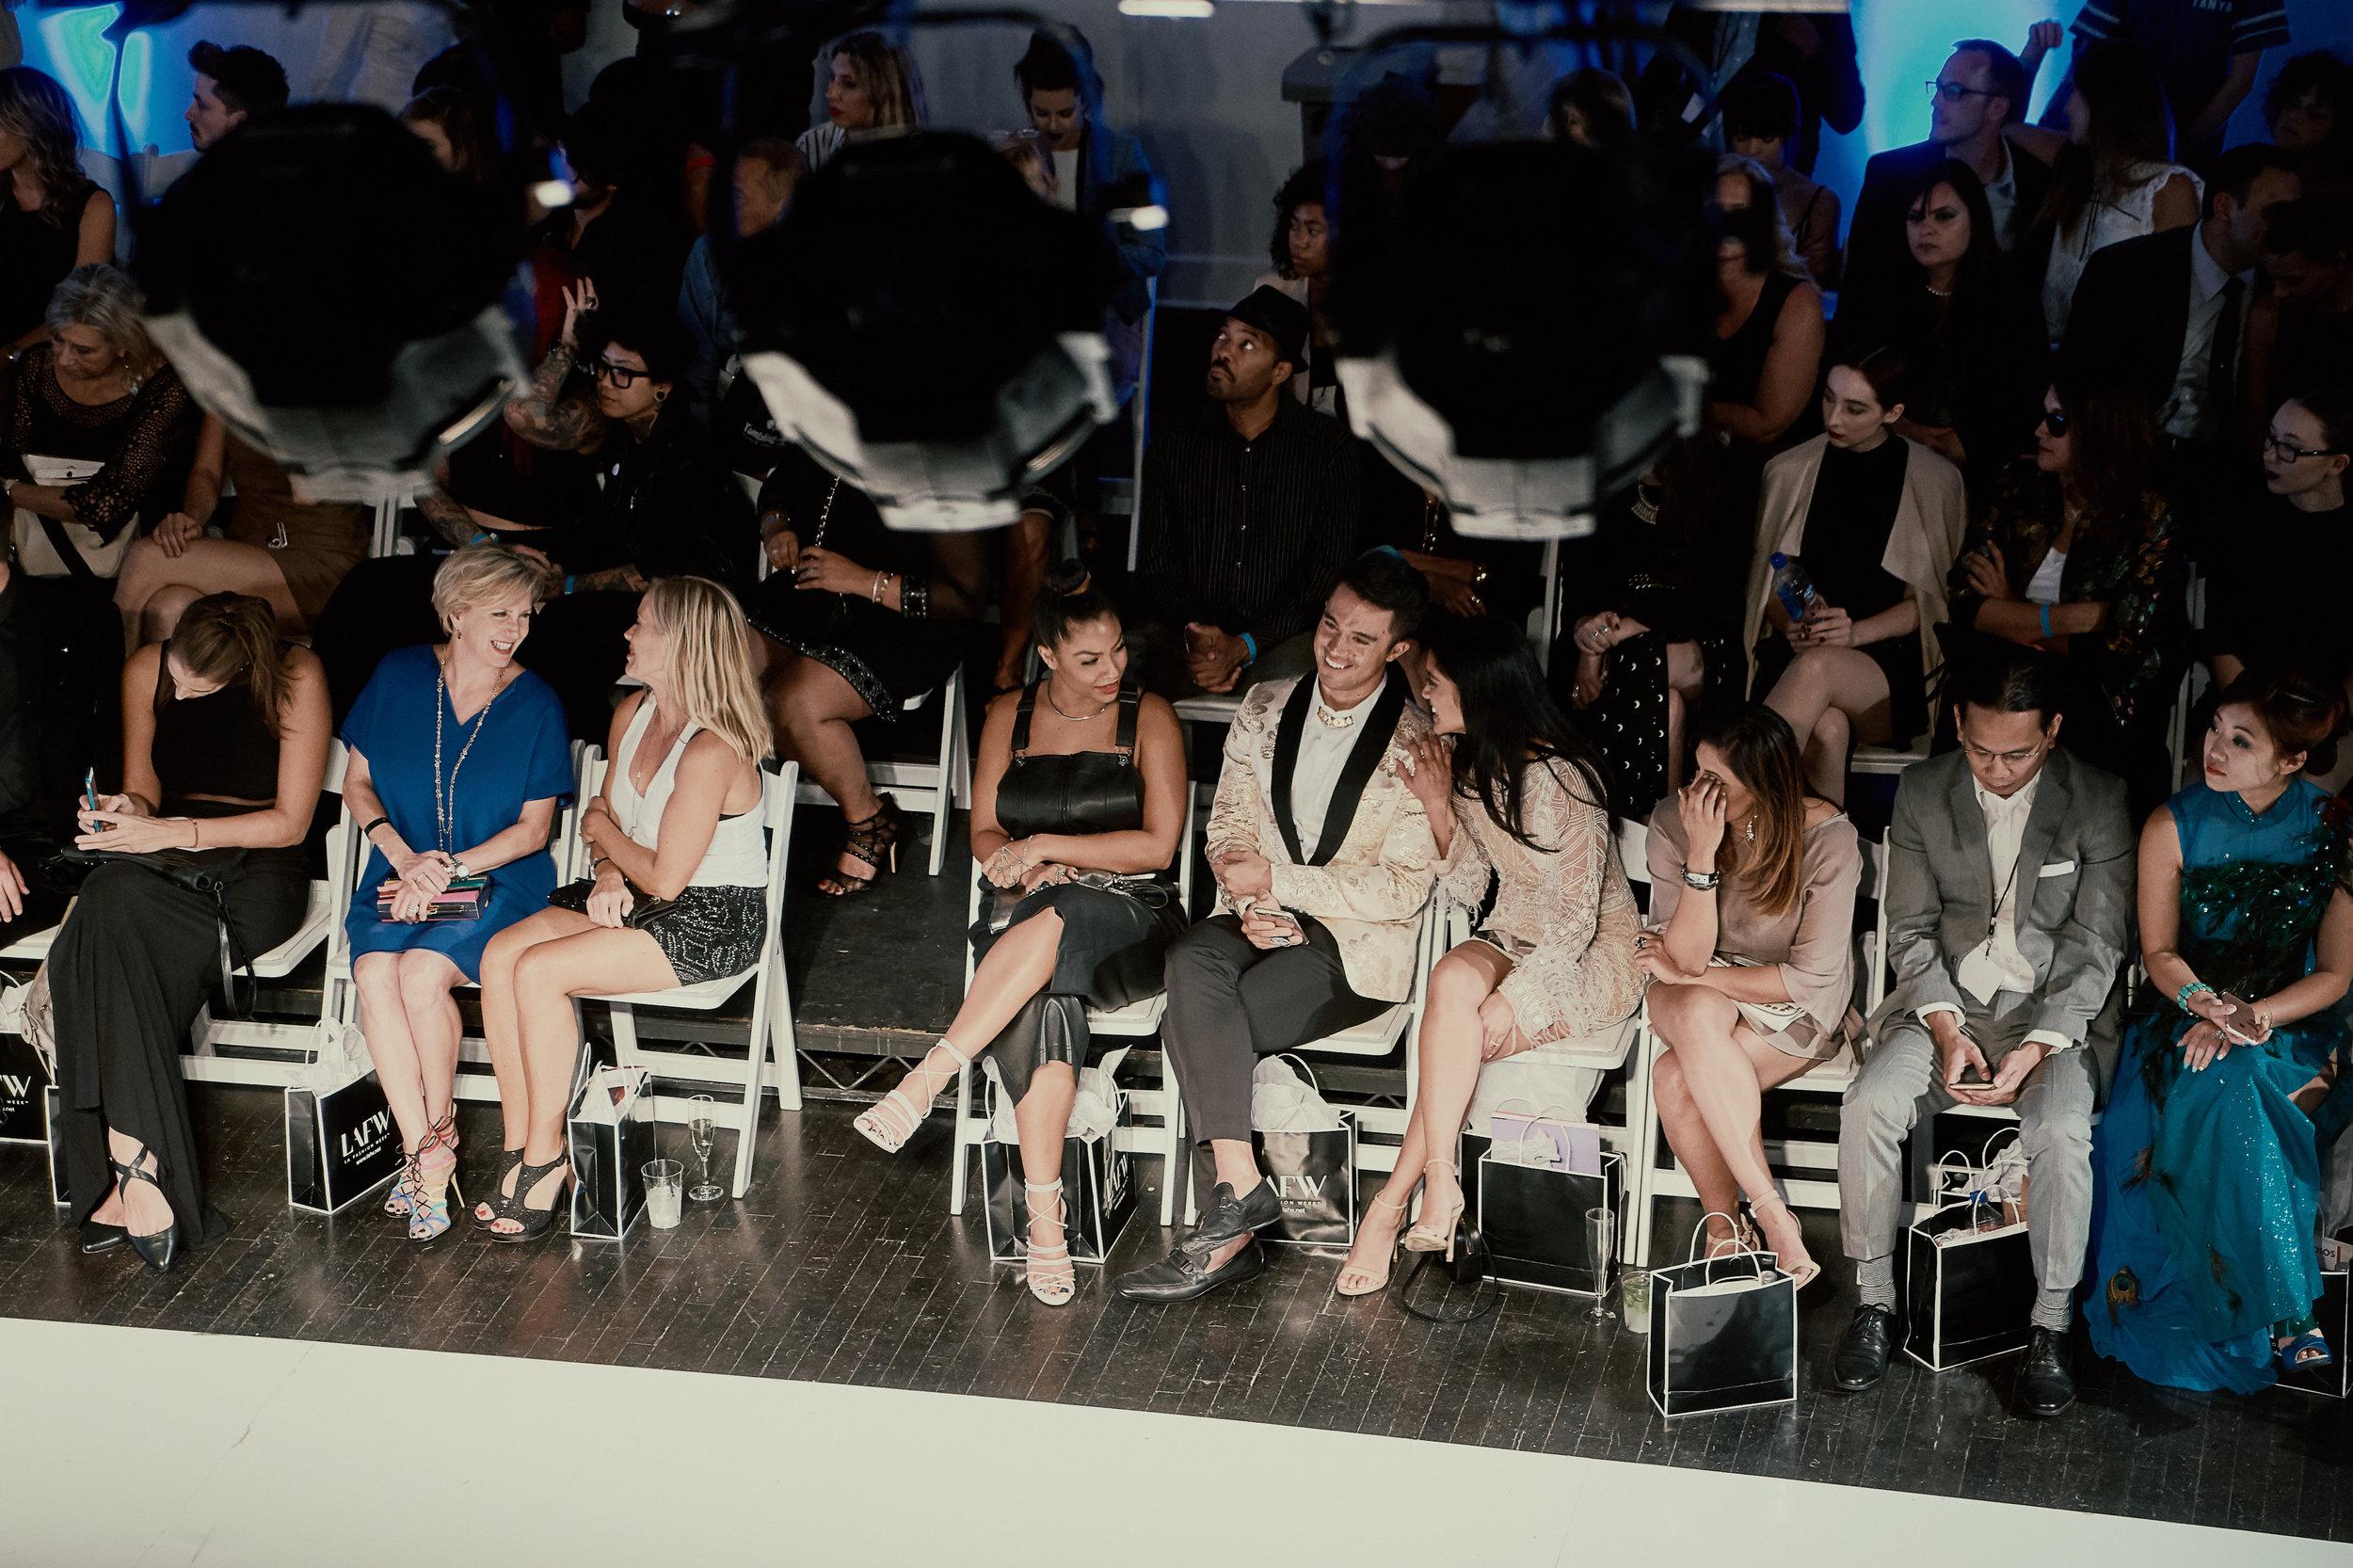 Front Row with Tiaan & Rigel Gemini